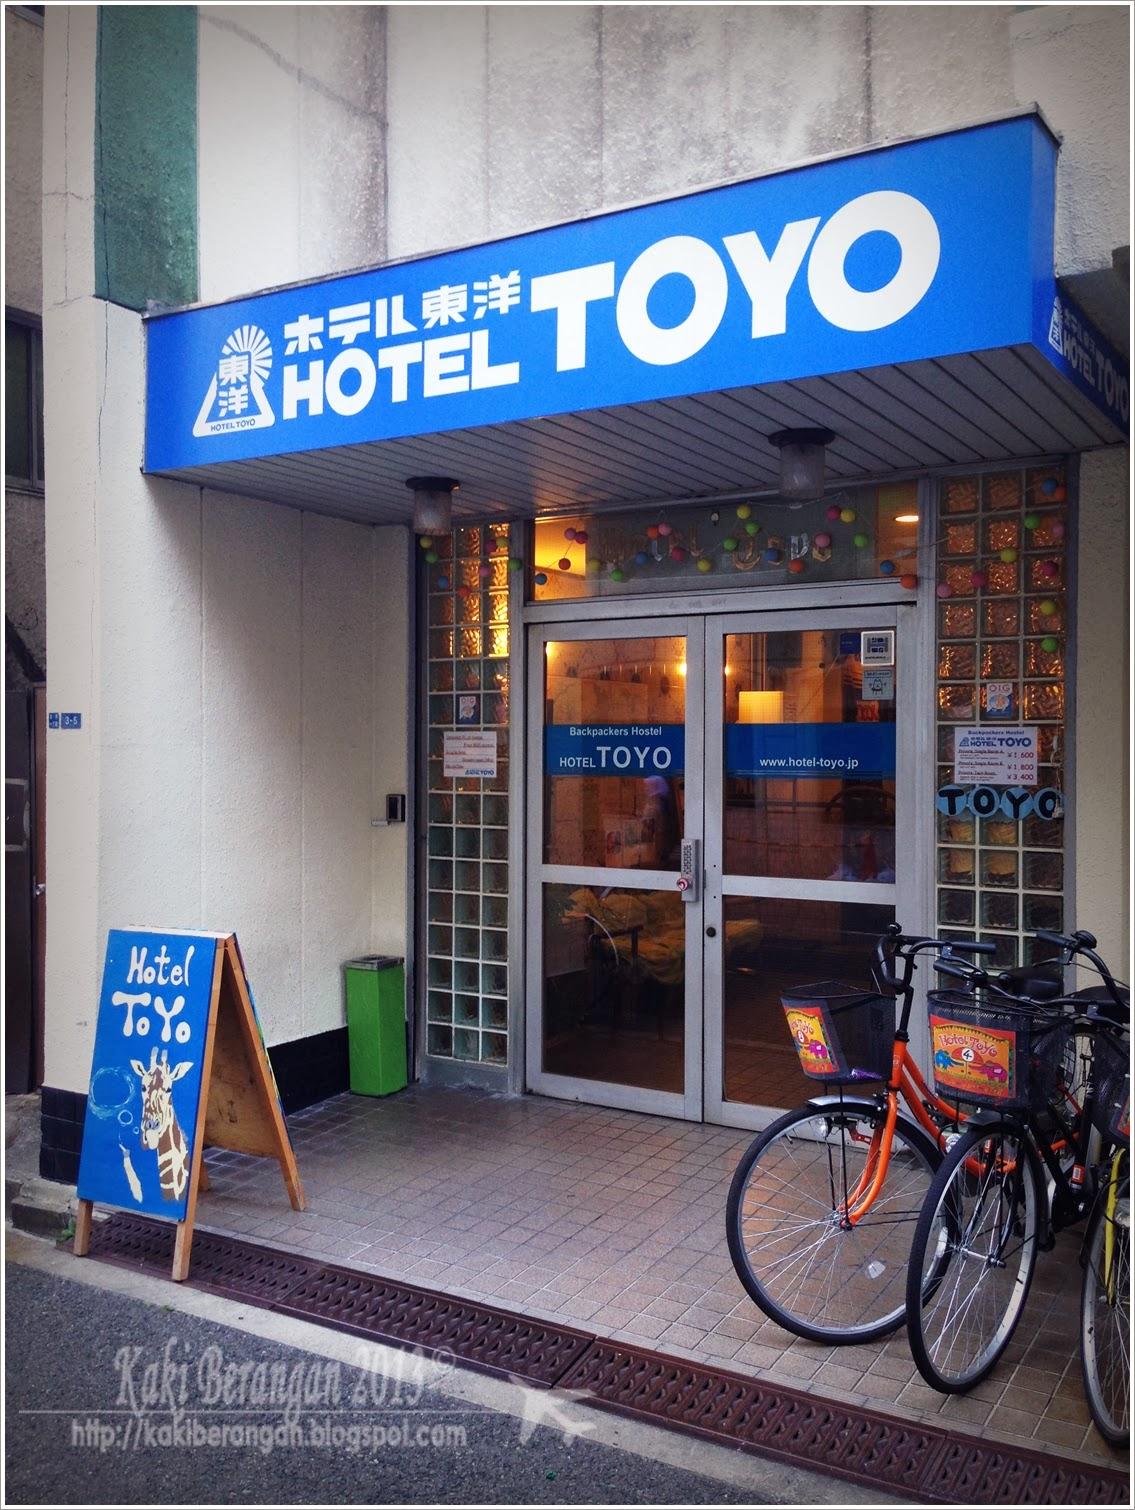 Hotel Toyo Ye Bukan Toyol Ni Kitaorang Menginap Hanya 1 Malam Je Ketika First Night Kat Osaka After Balik Dari Nara Untuk Booking Diuruskan